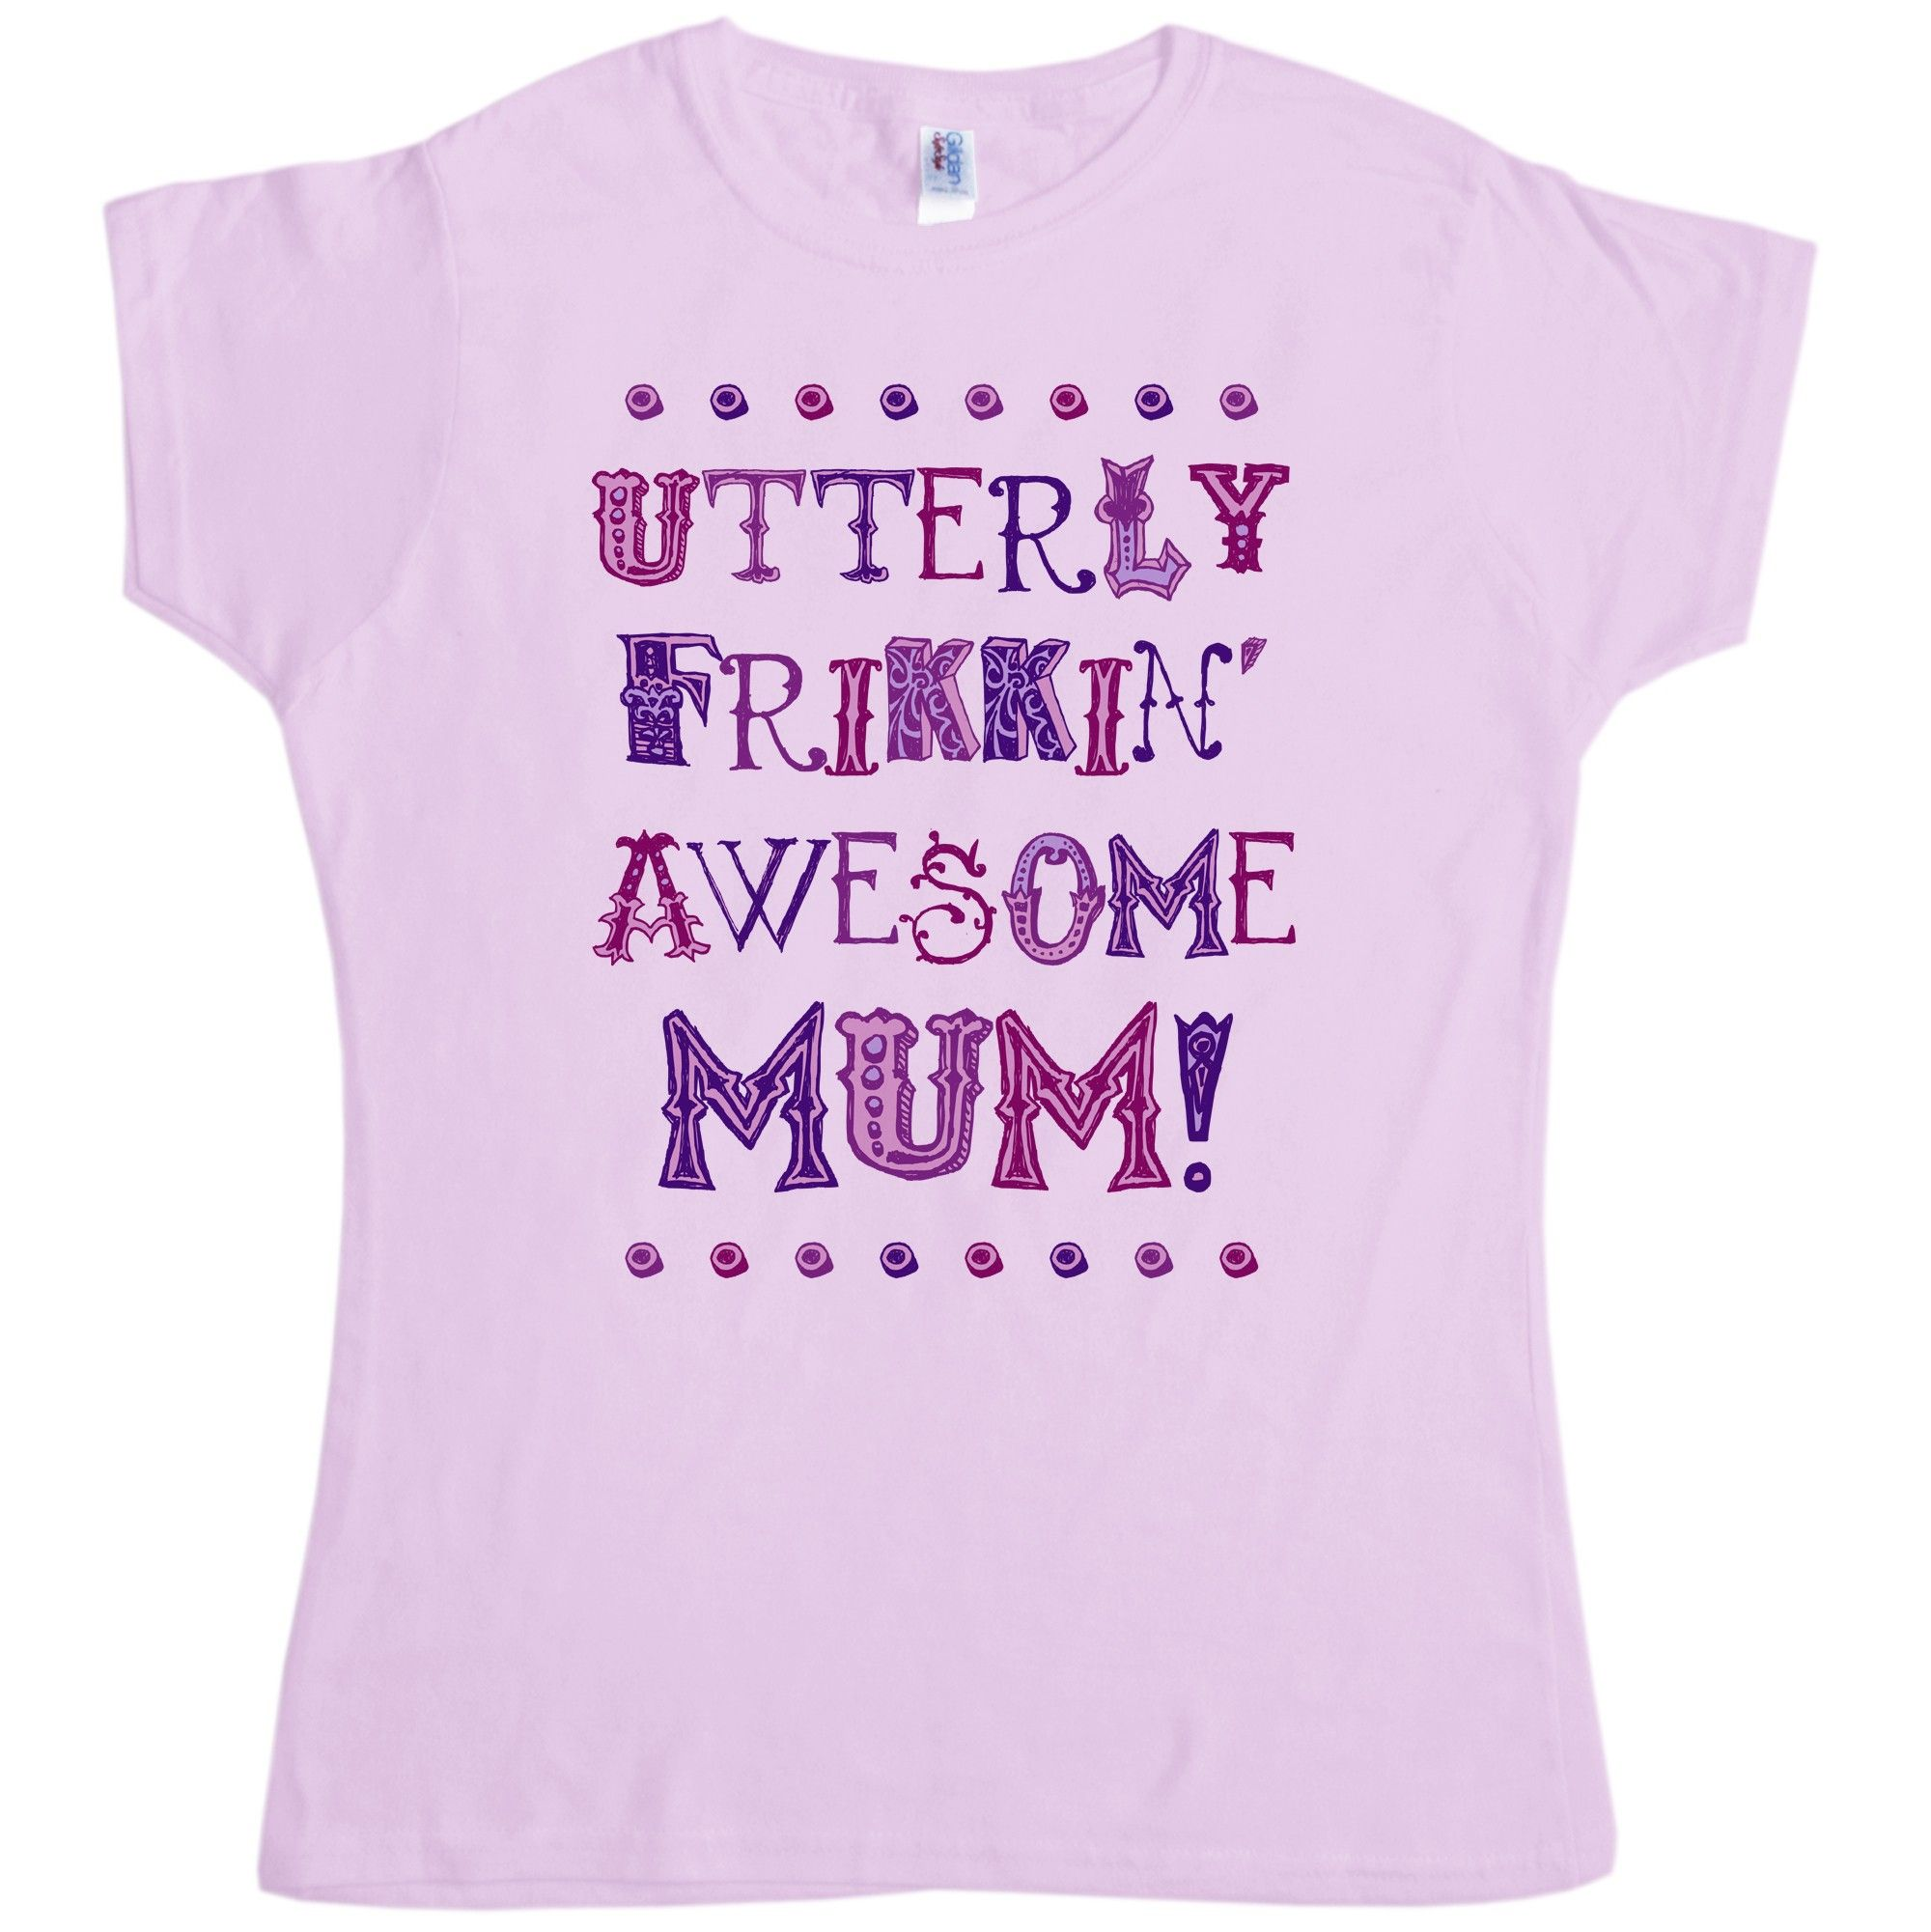 Utterly Frikkin' Awesome Mum t-shirt - #MothersDay at 8Ball.co.uk